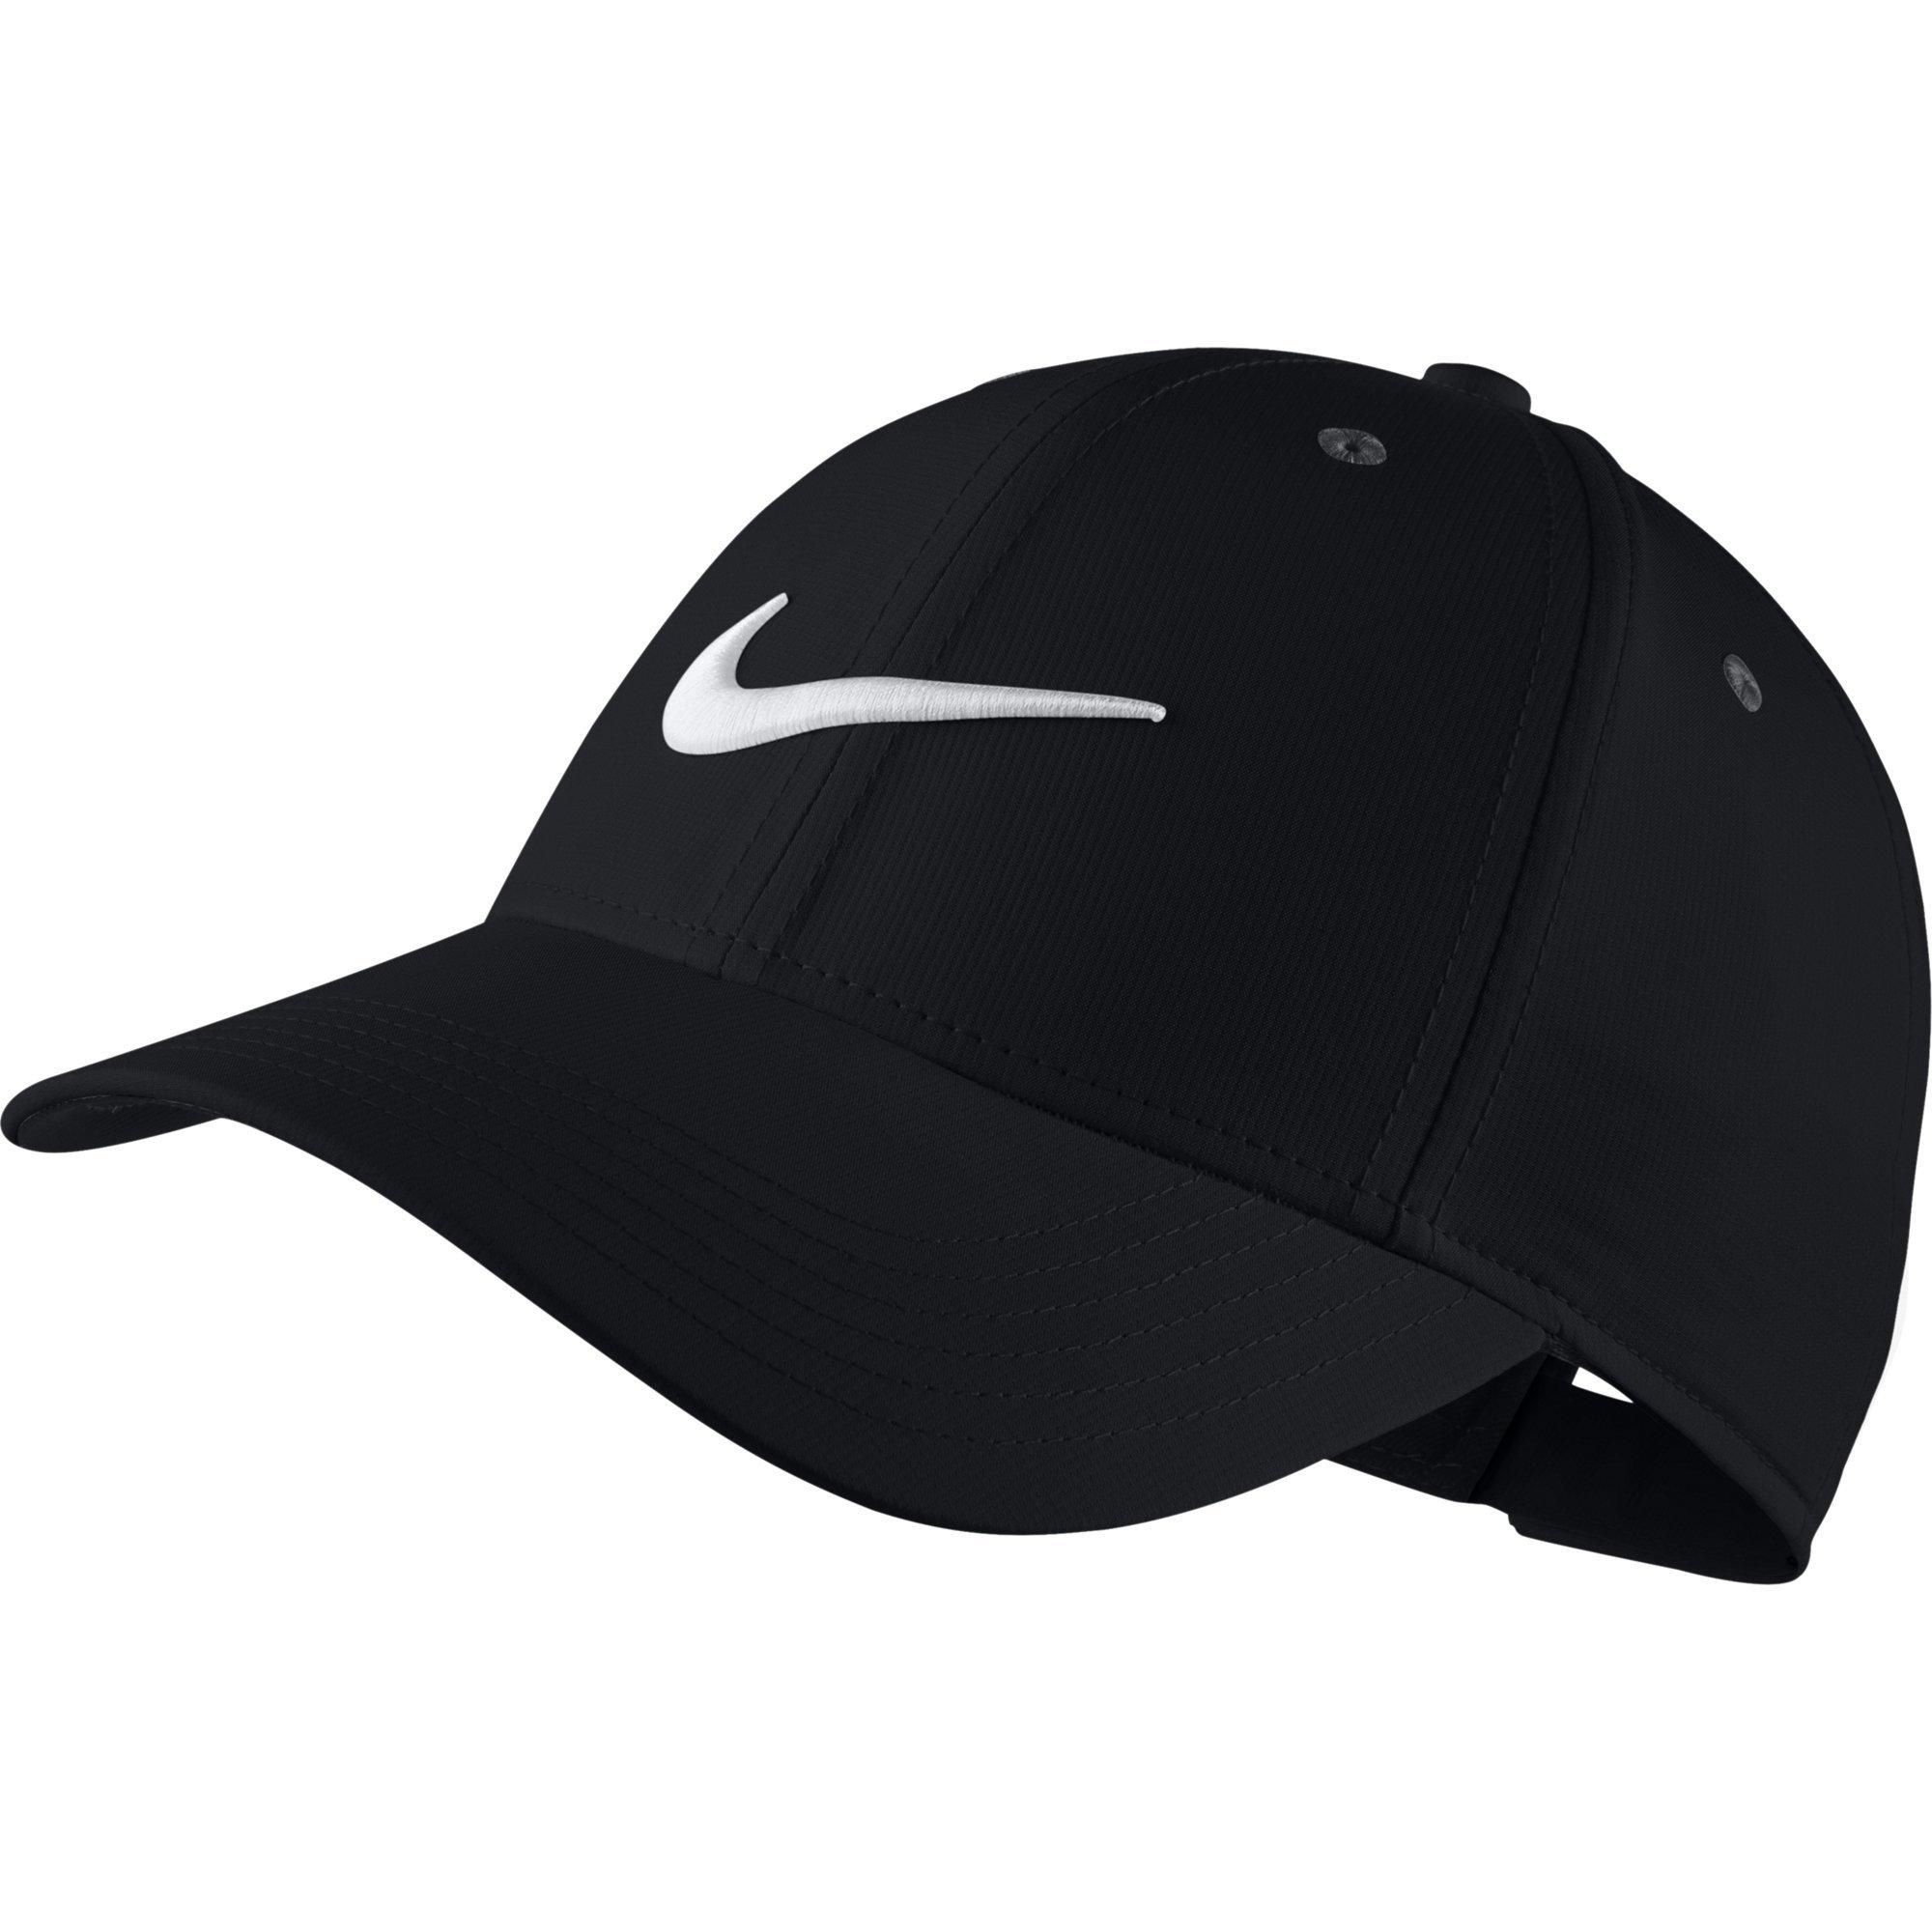 NIKE Kid's Unisex Core Golf Cap, Black/Anthracite/White, One Size